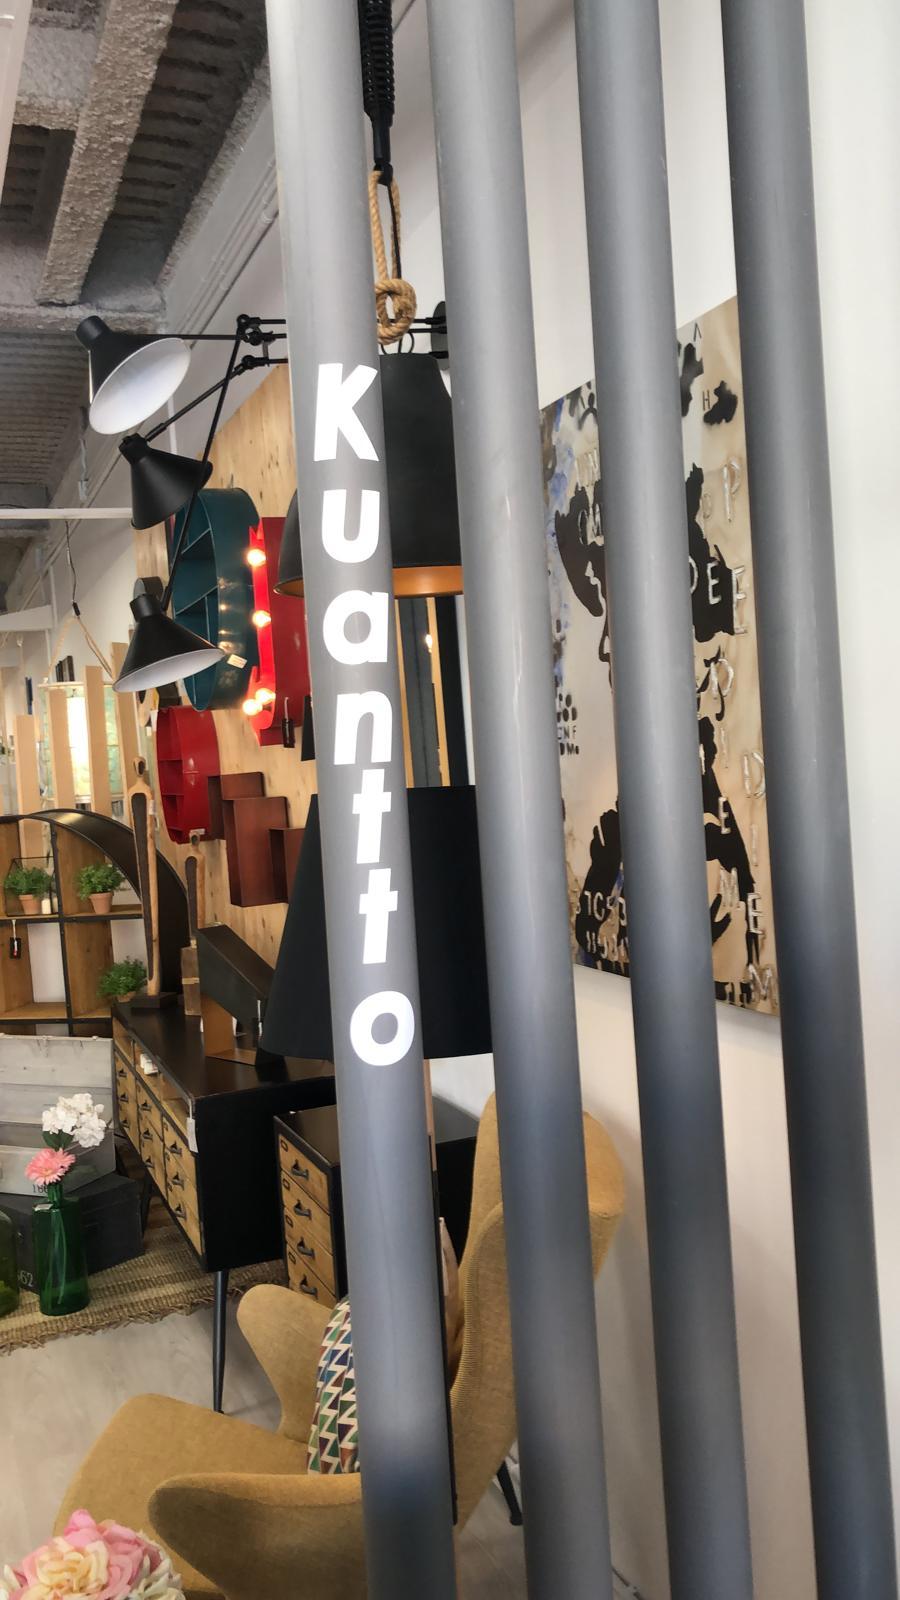 Logo de Kuantto home en vertical